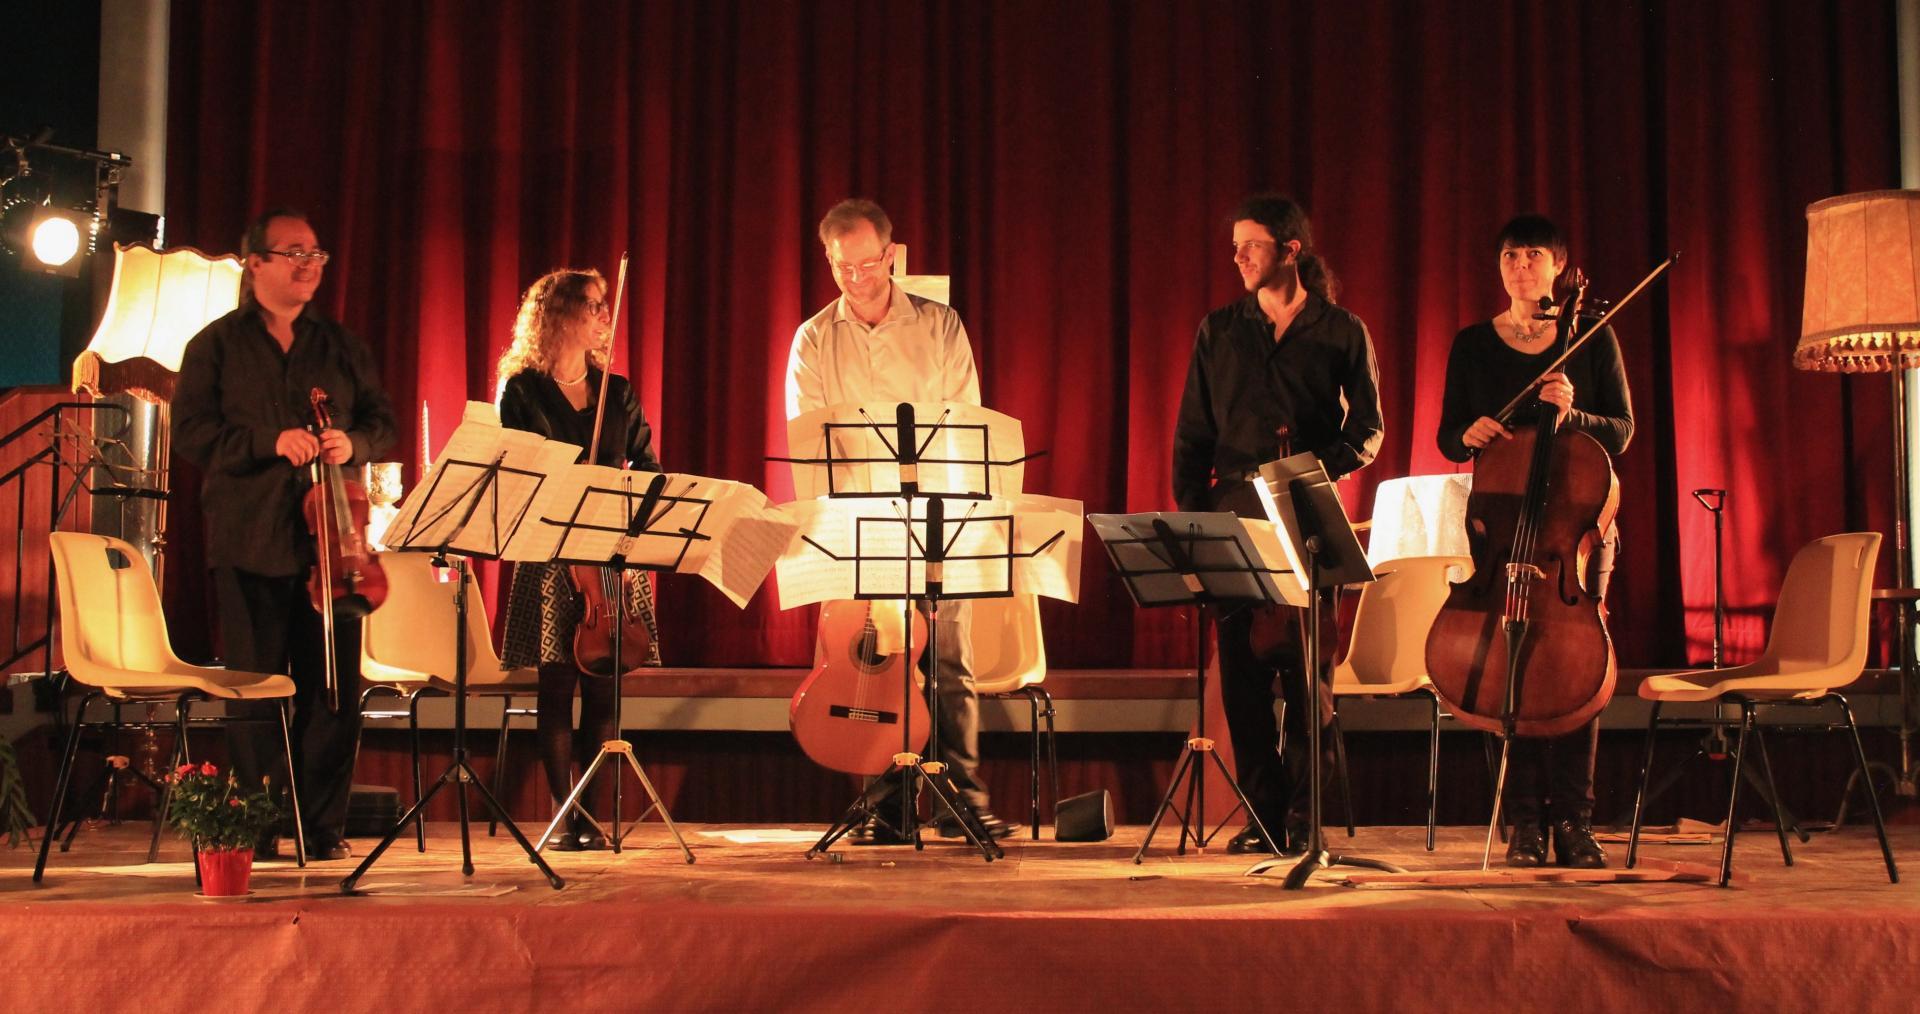 Concert cordes guitare Union Musicale de l'Albarine 12 mars 2017